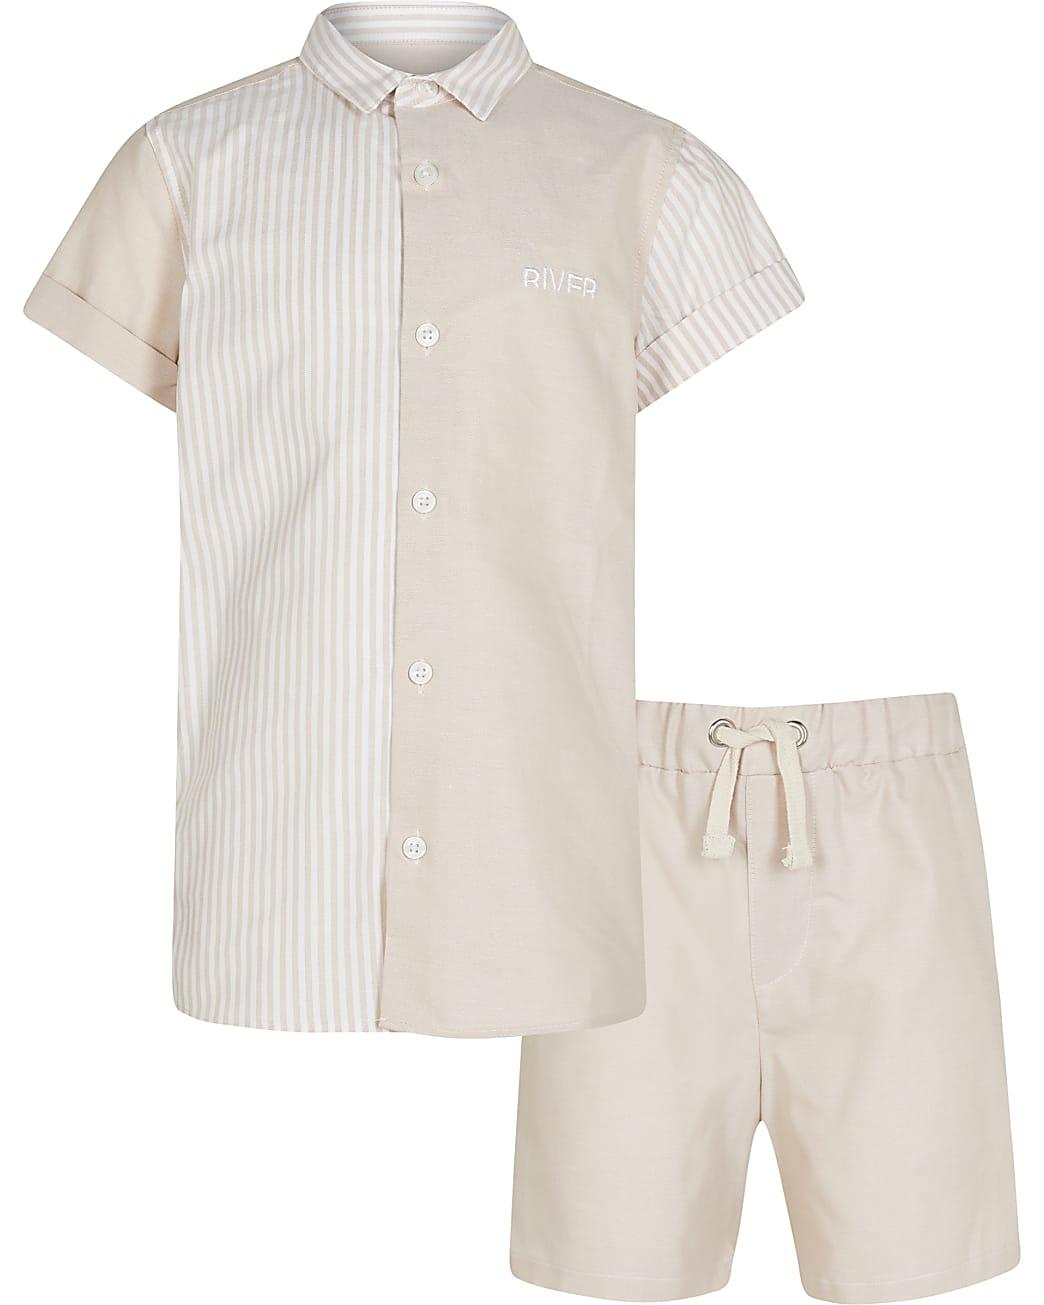 Age 13+ boys cream stripe polo shirt outfit